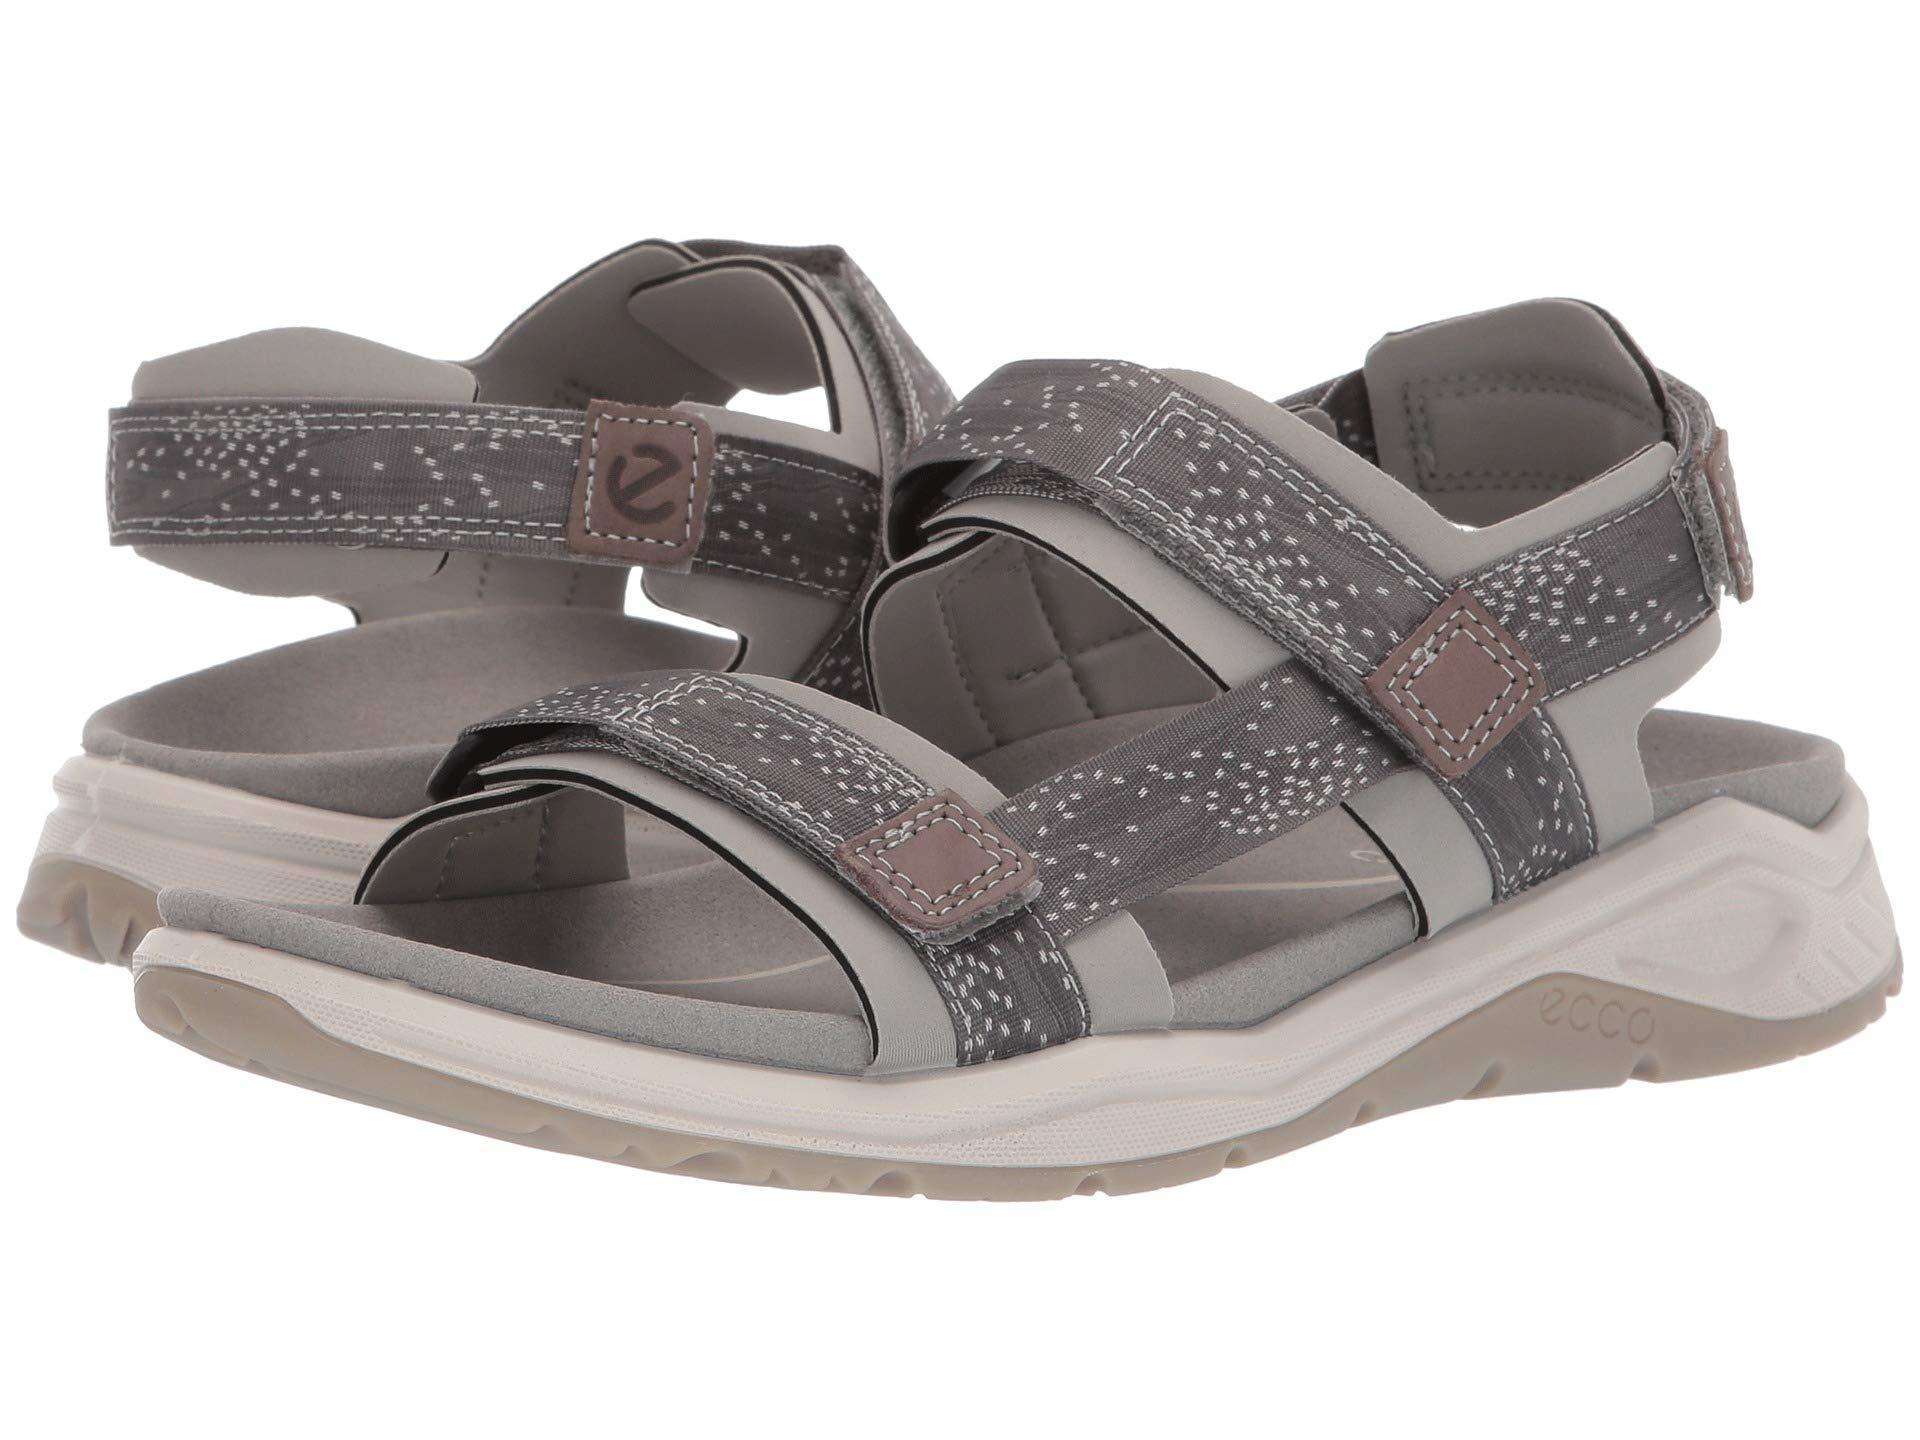 e66be00e8fa1b1 Lyst - Ecco X-trinsic Strap Sandal (black teaberry) Women s Sandals ...